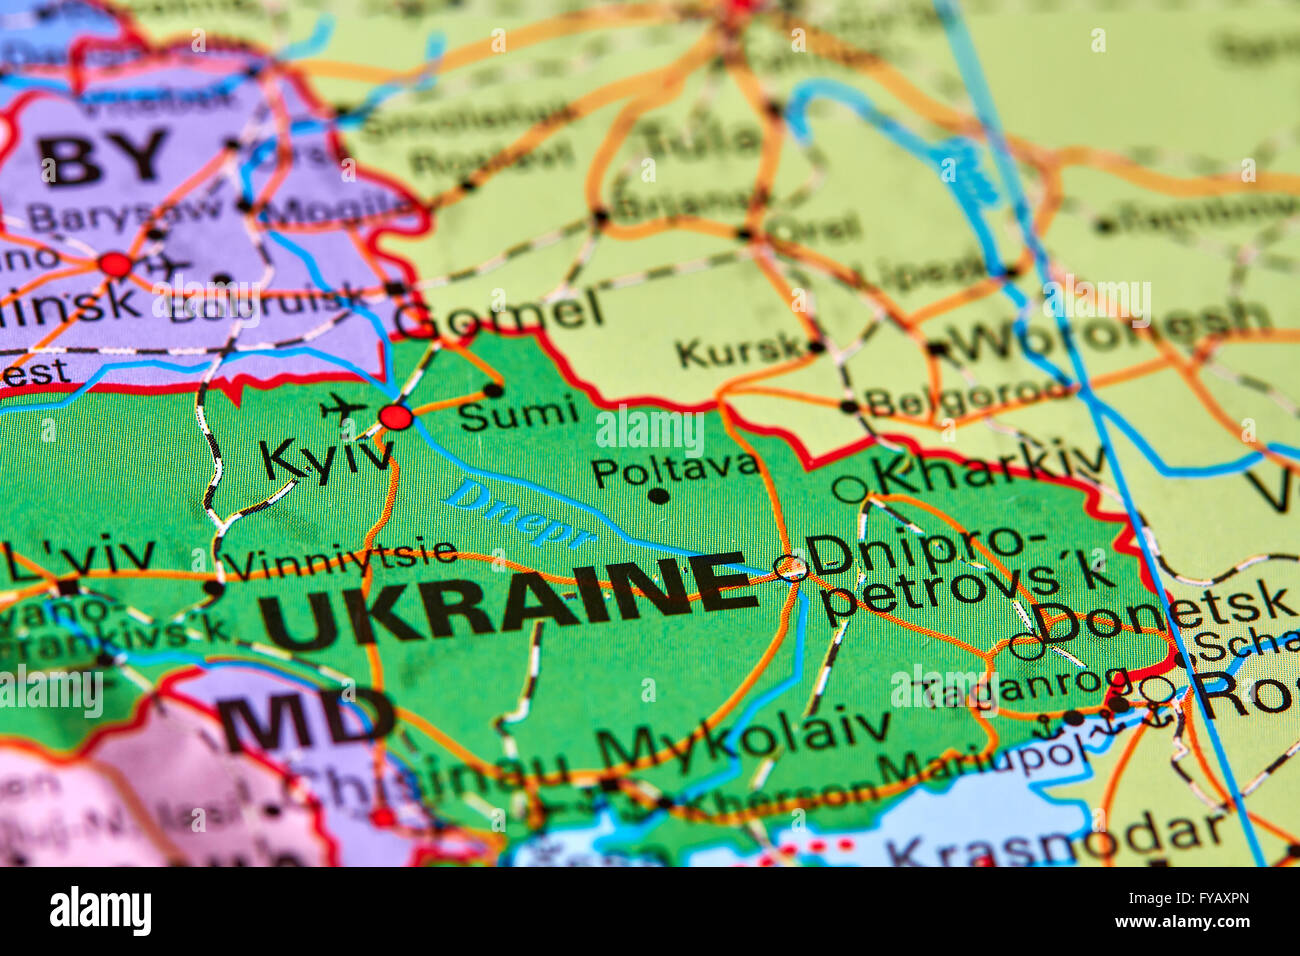 Ukraine Europe Map Stock Photos Ukraine Europe Map Stock Images